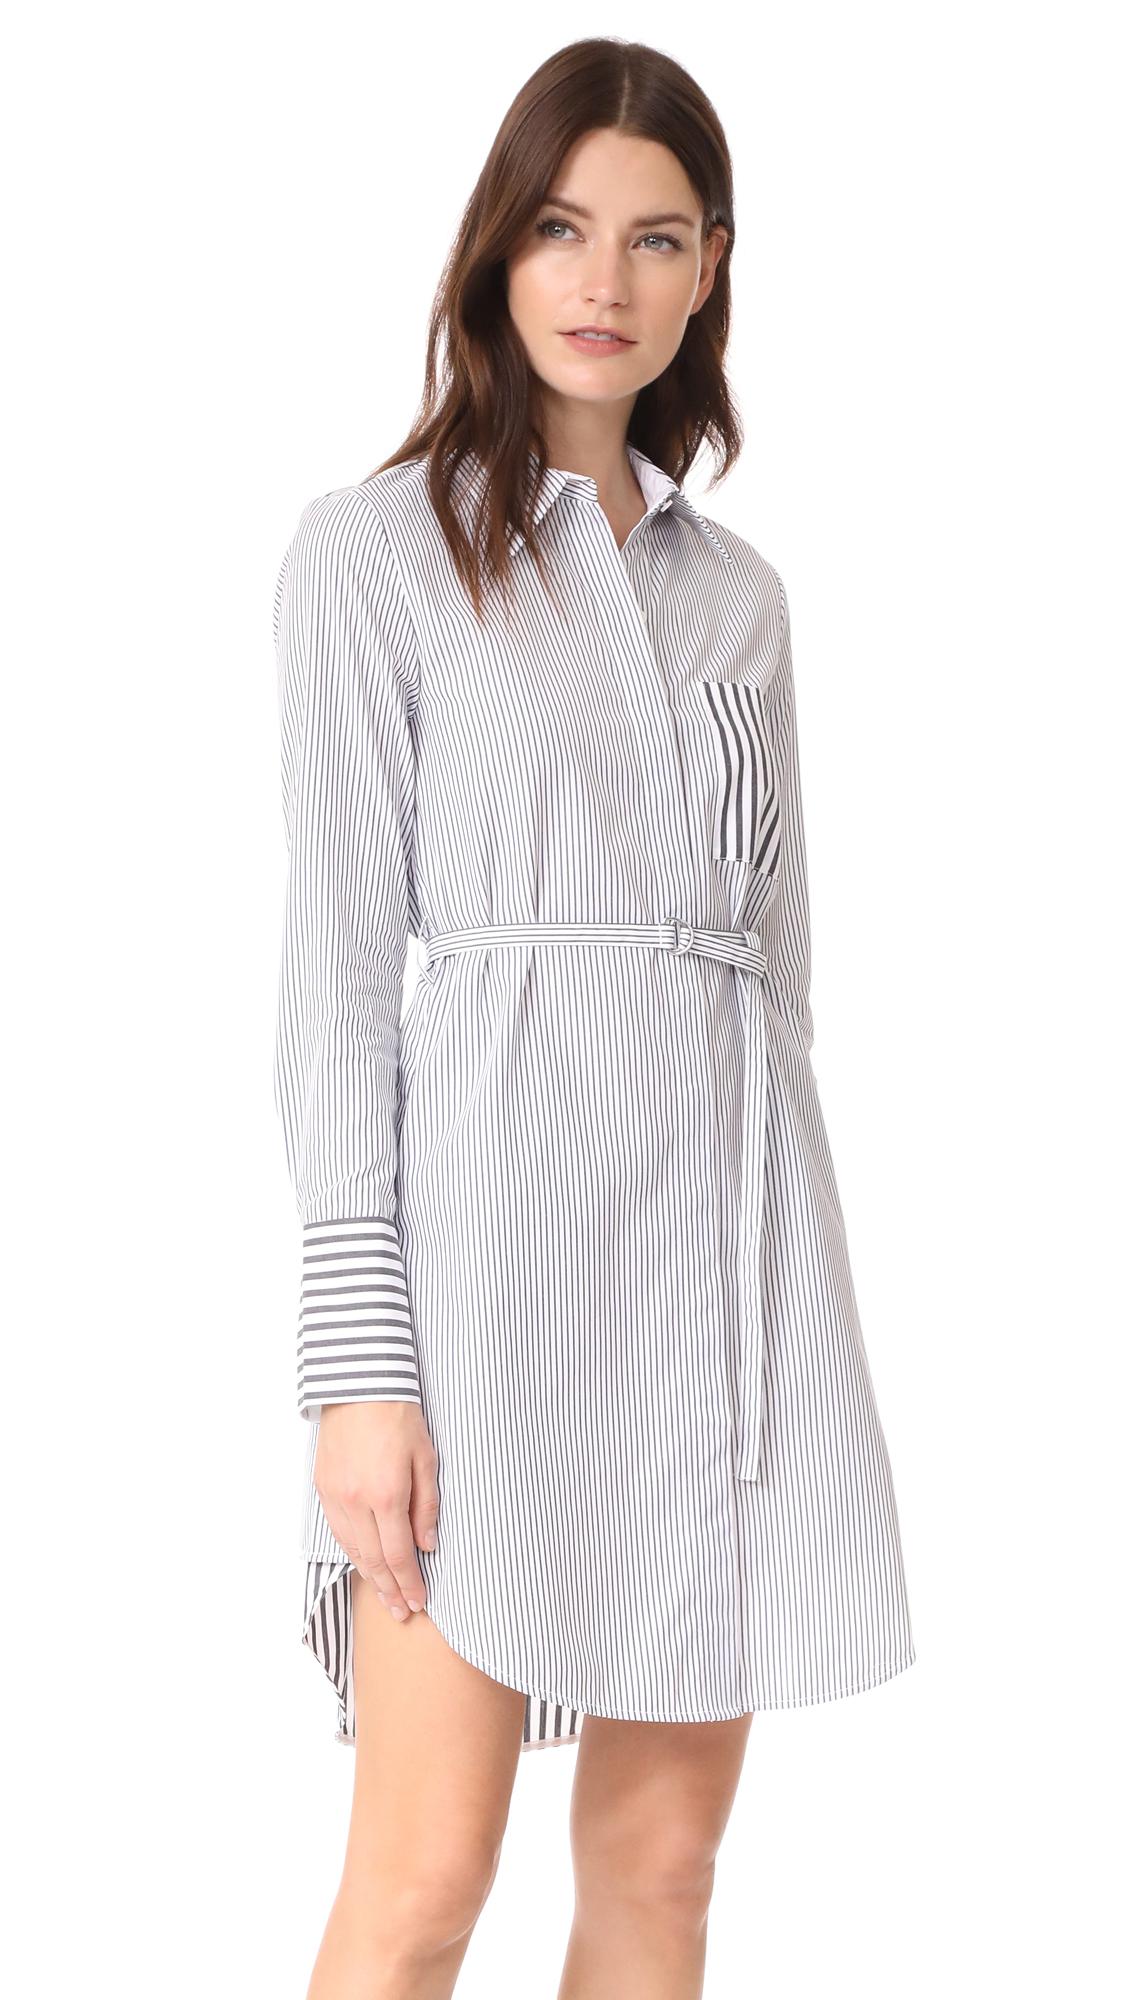 Edition10 Striped Shirtdress - Black/White